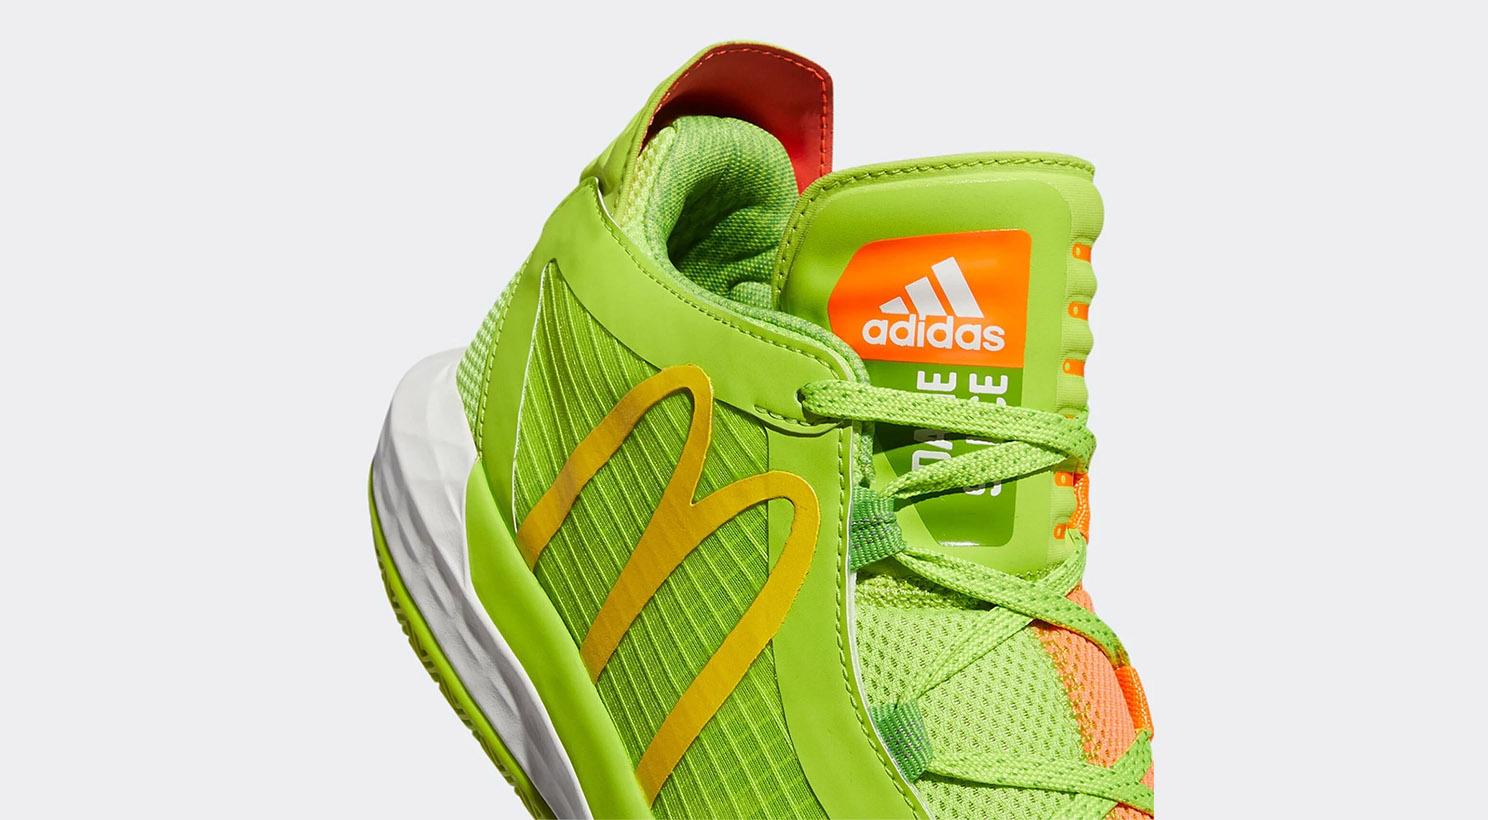 adidas_mcdonalds_3